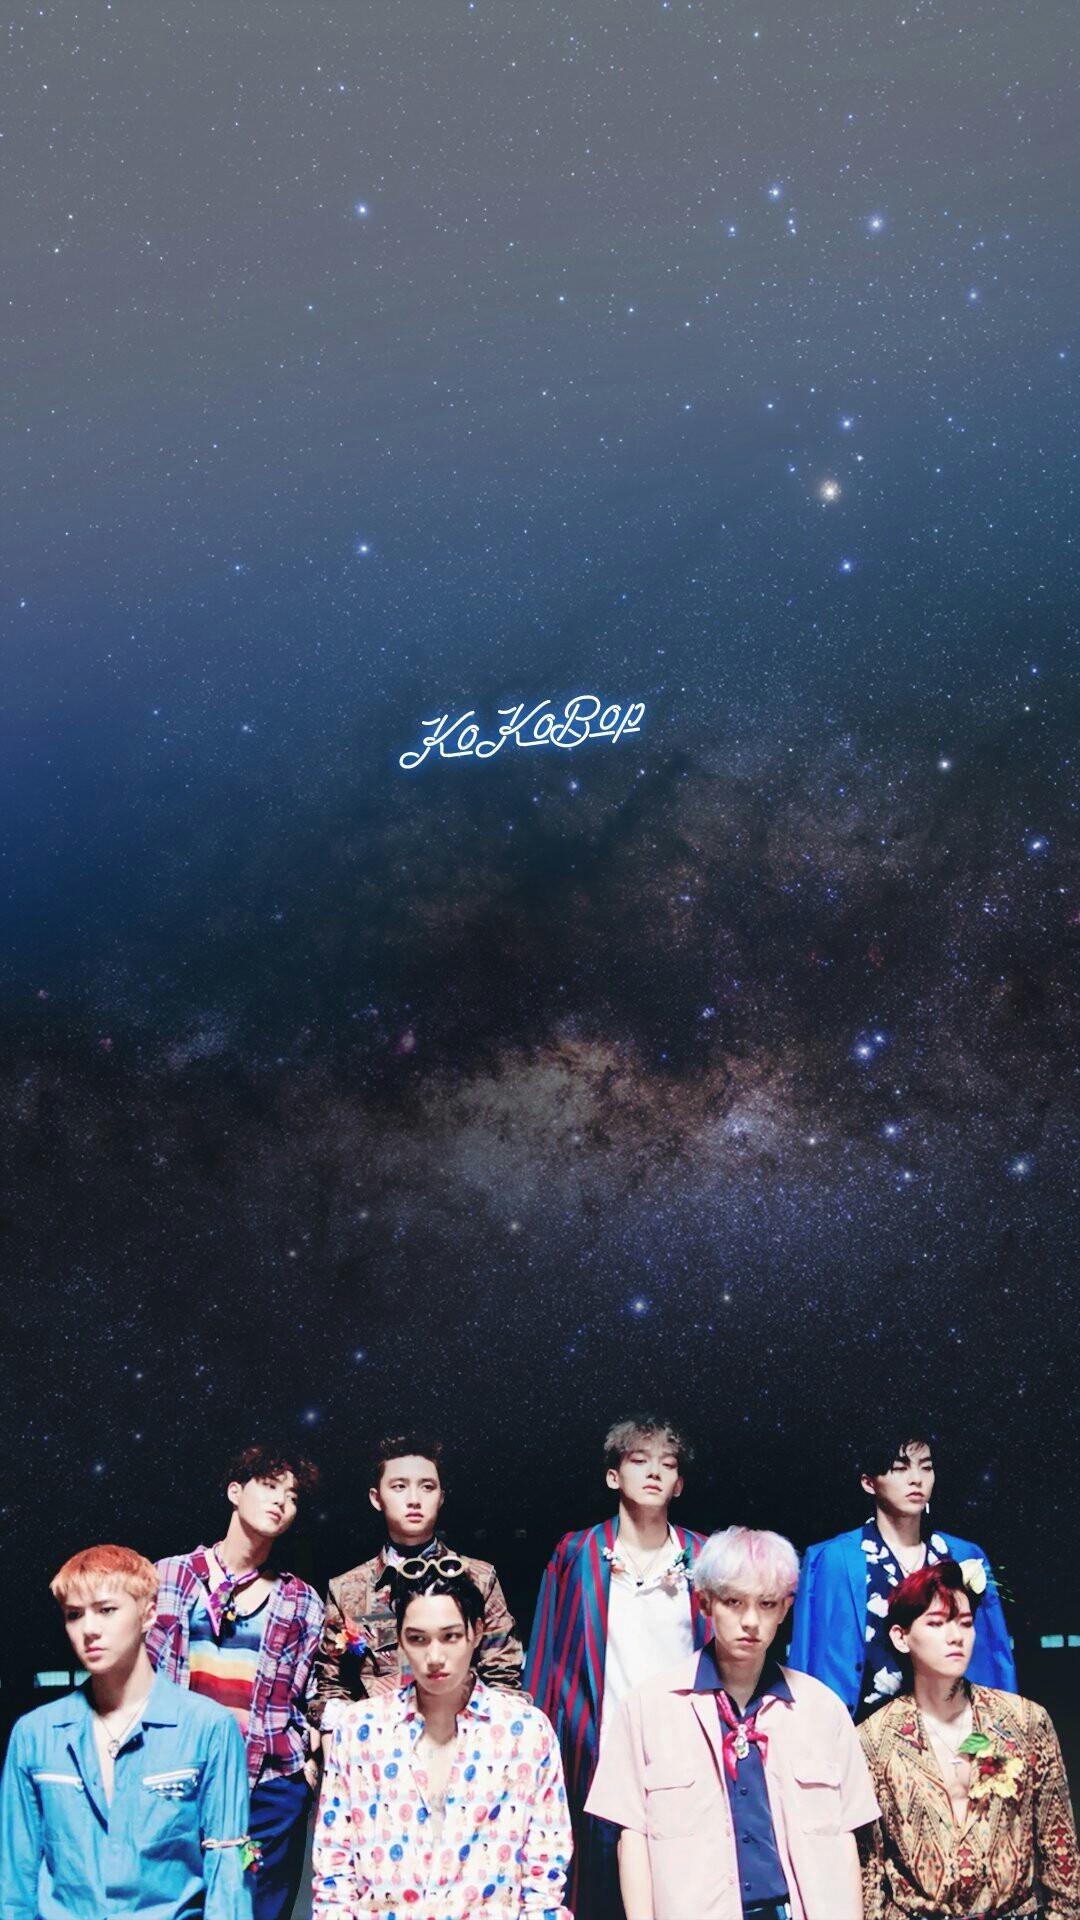 EXO COMEBACK 2017 WALLPAPER | #EXO #COMEBACK #July2017 | #엑소 #KoKoBop